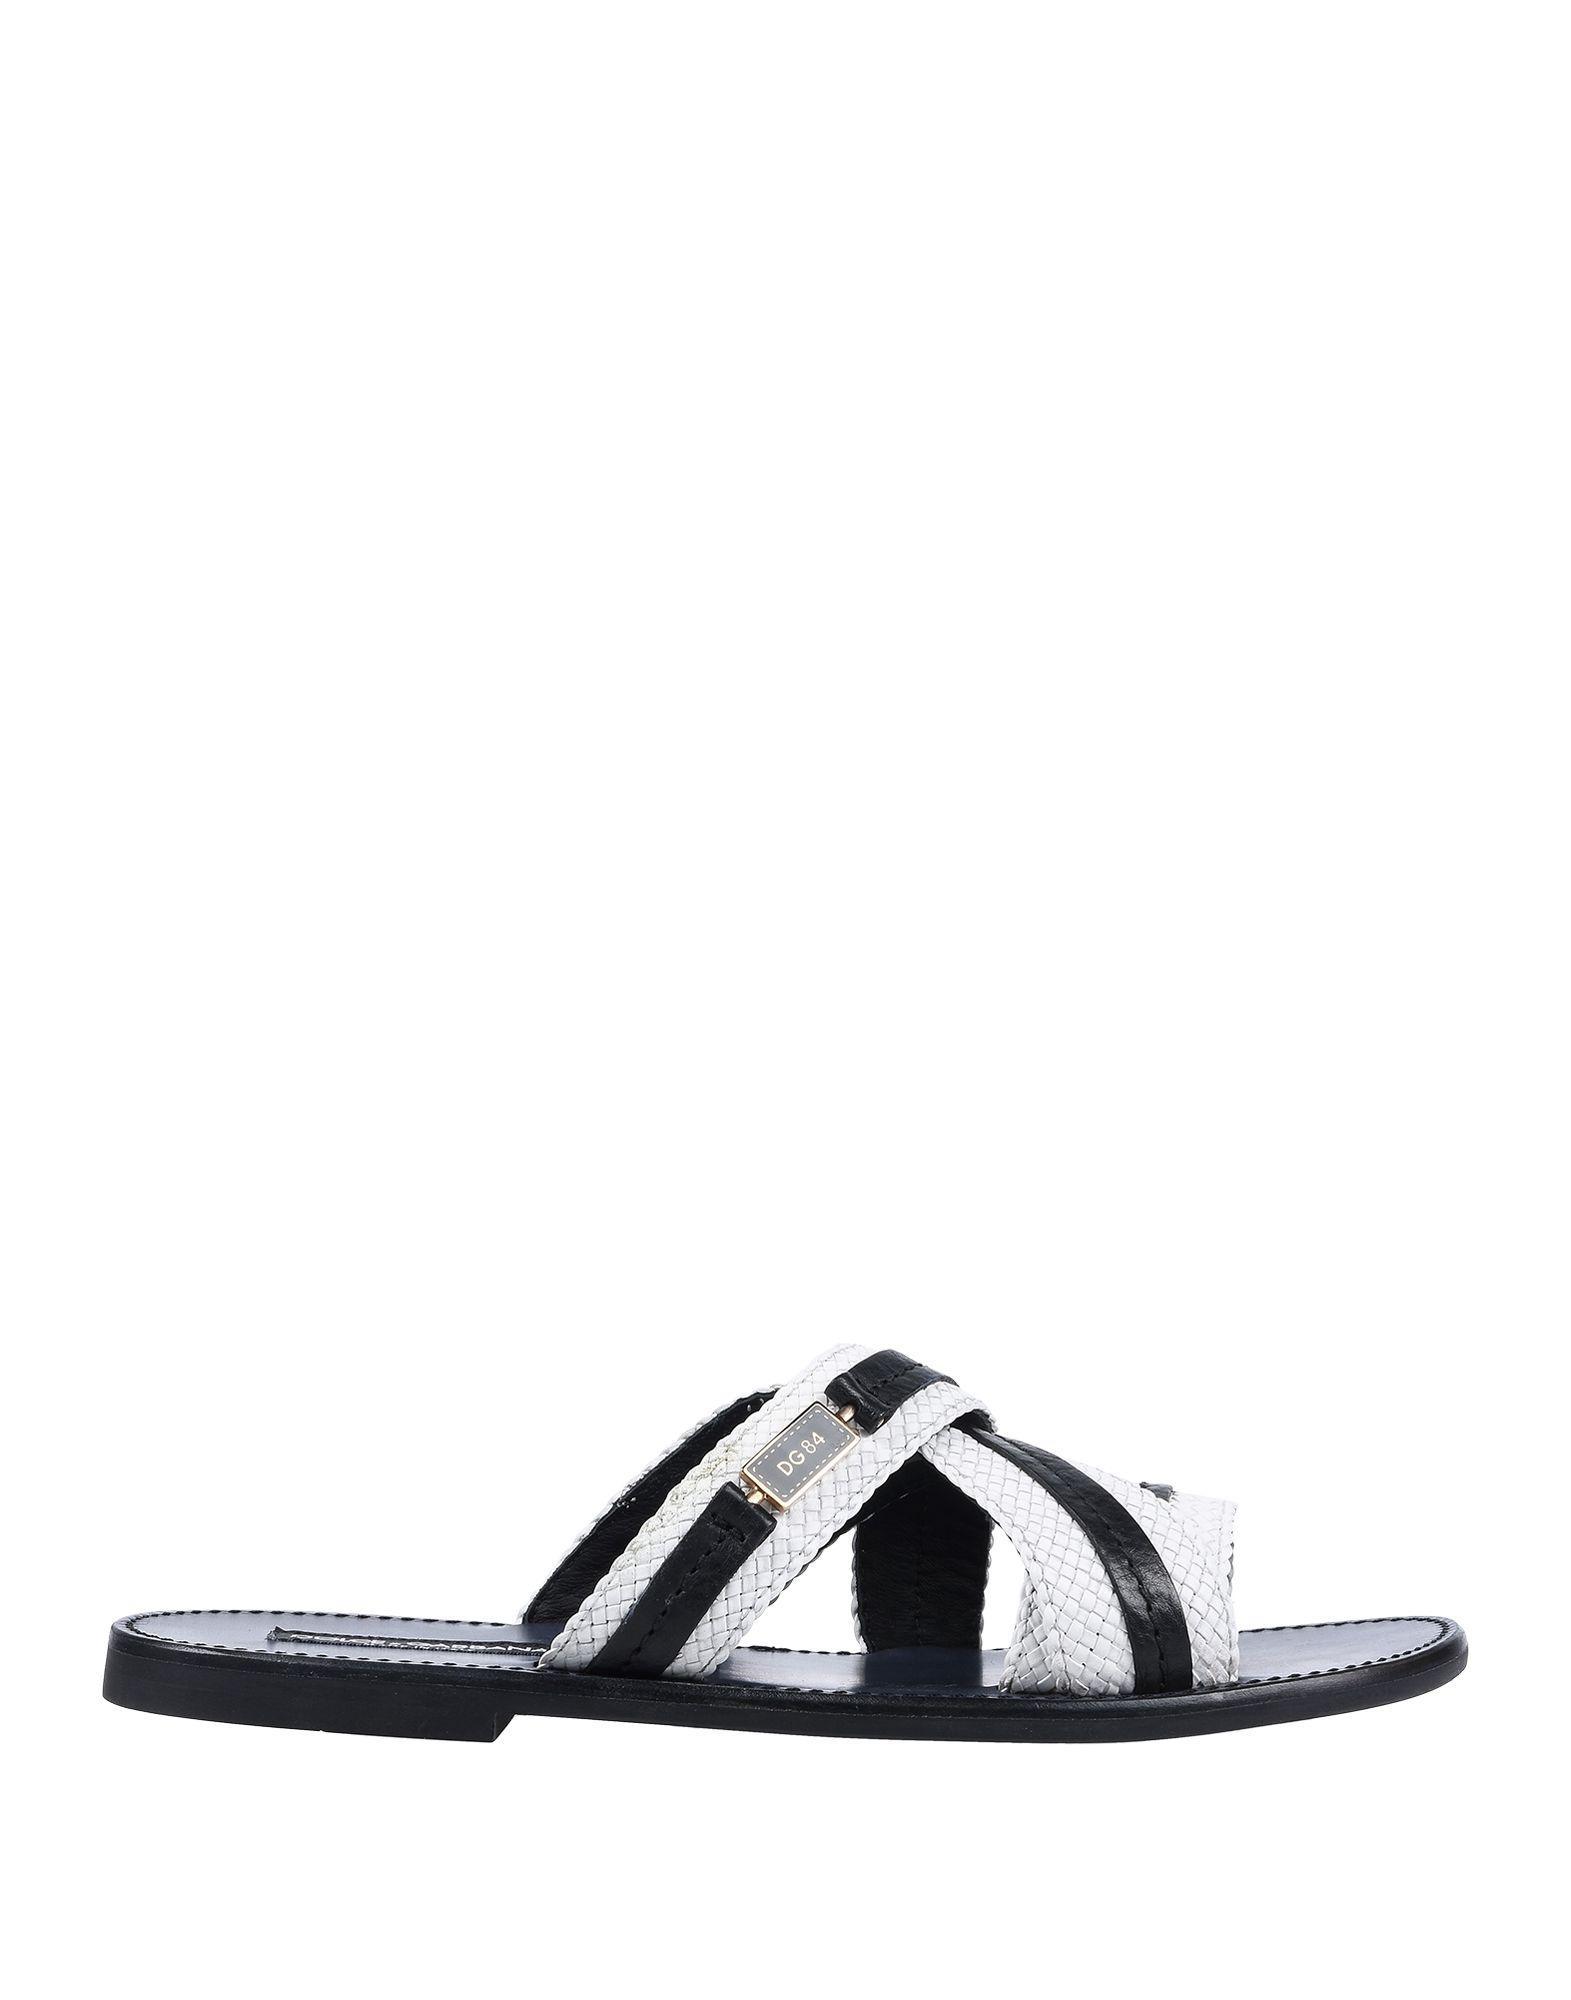 Dolceamp; Hombre Blanco Sandalias Gabbana De Color Lyst qMSVpzU